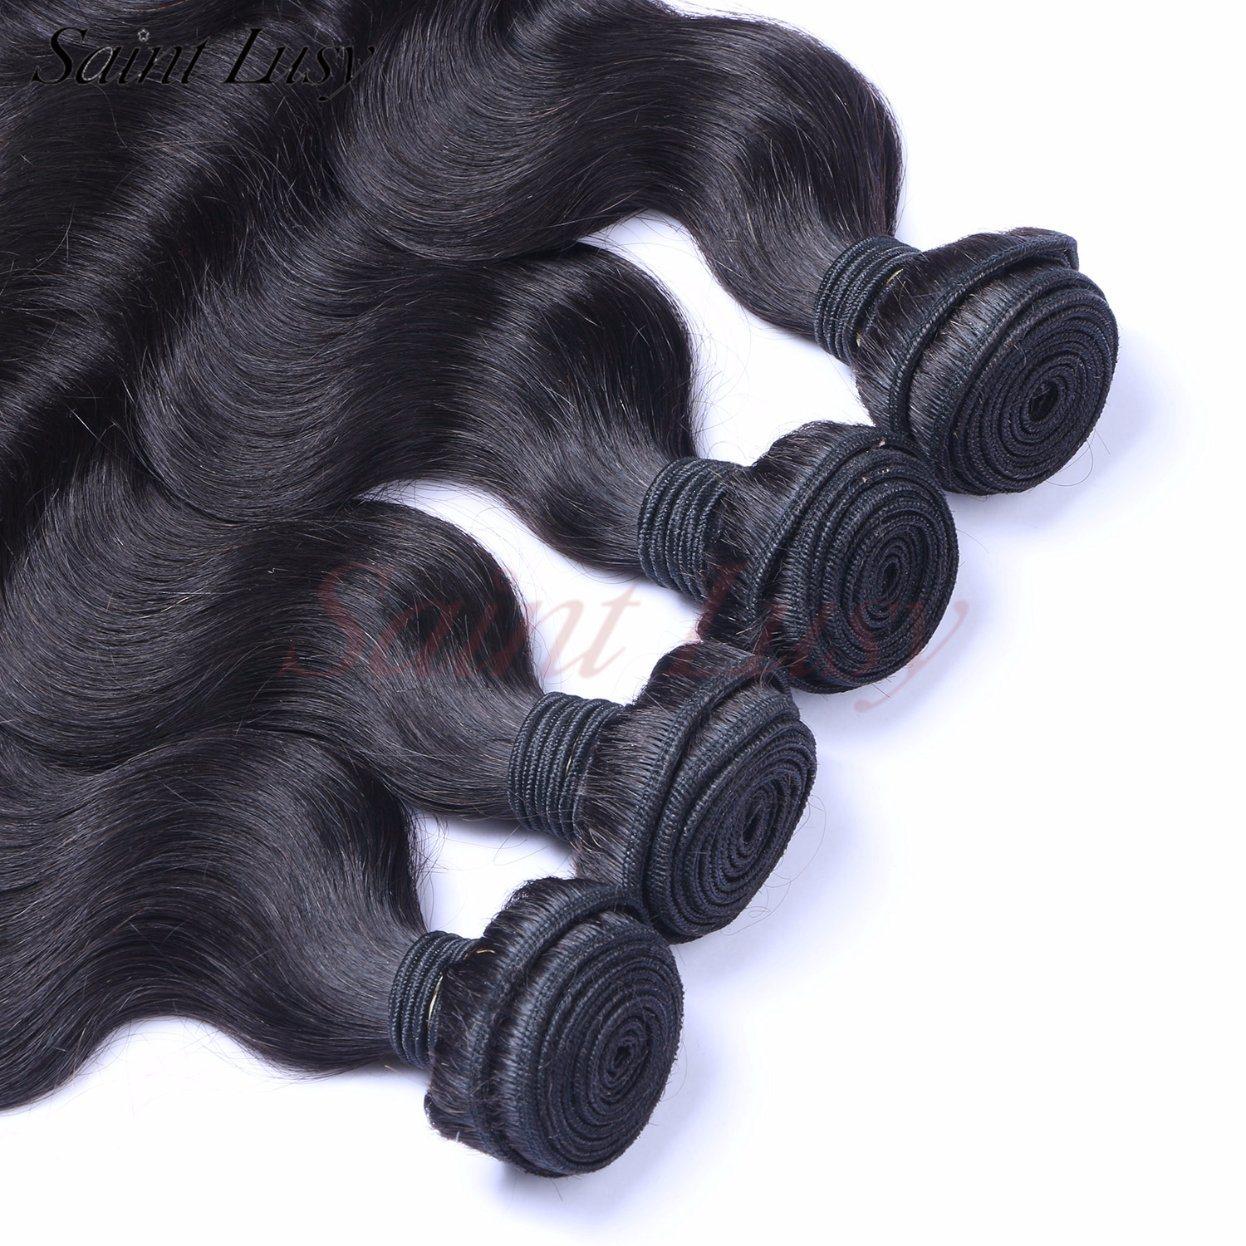 Wholesale Weaving Remy Hair Unprocessed Virgin Brazilian Human Hair (SL-HE7A001)